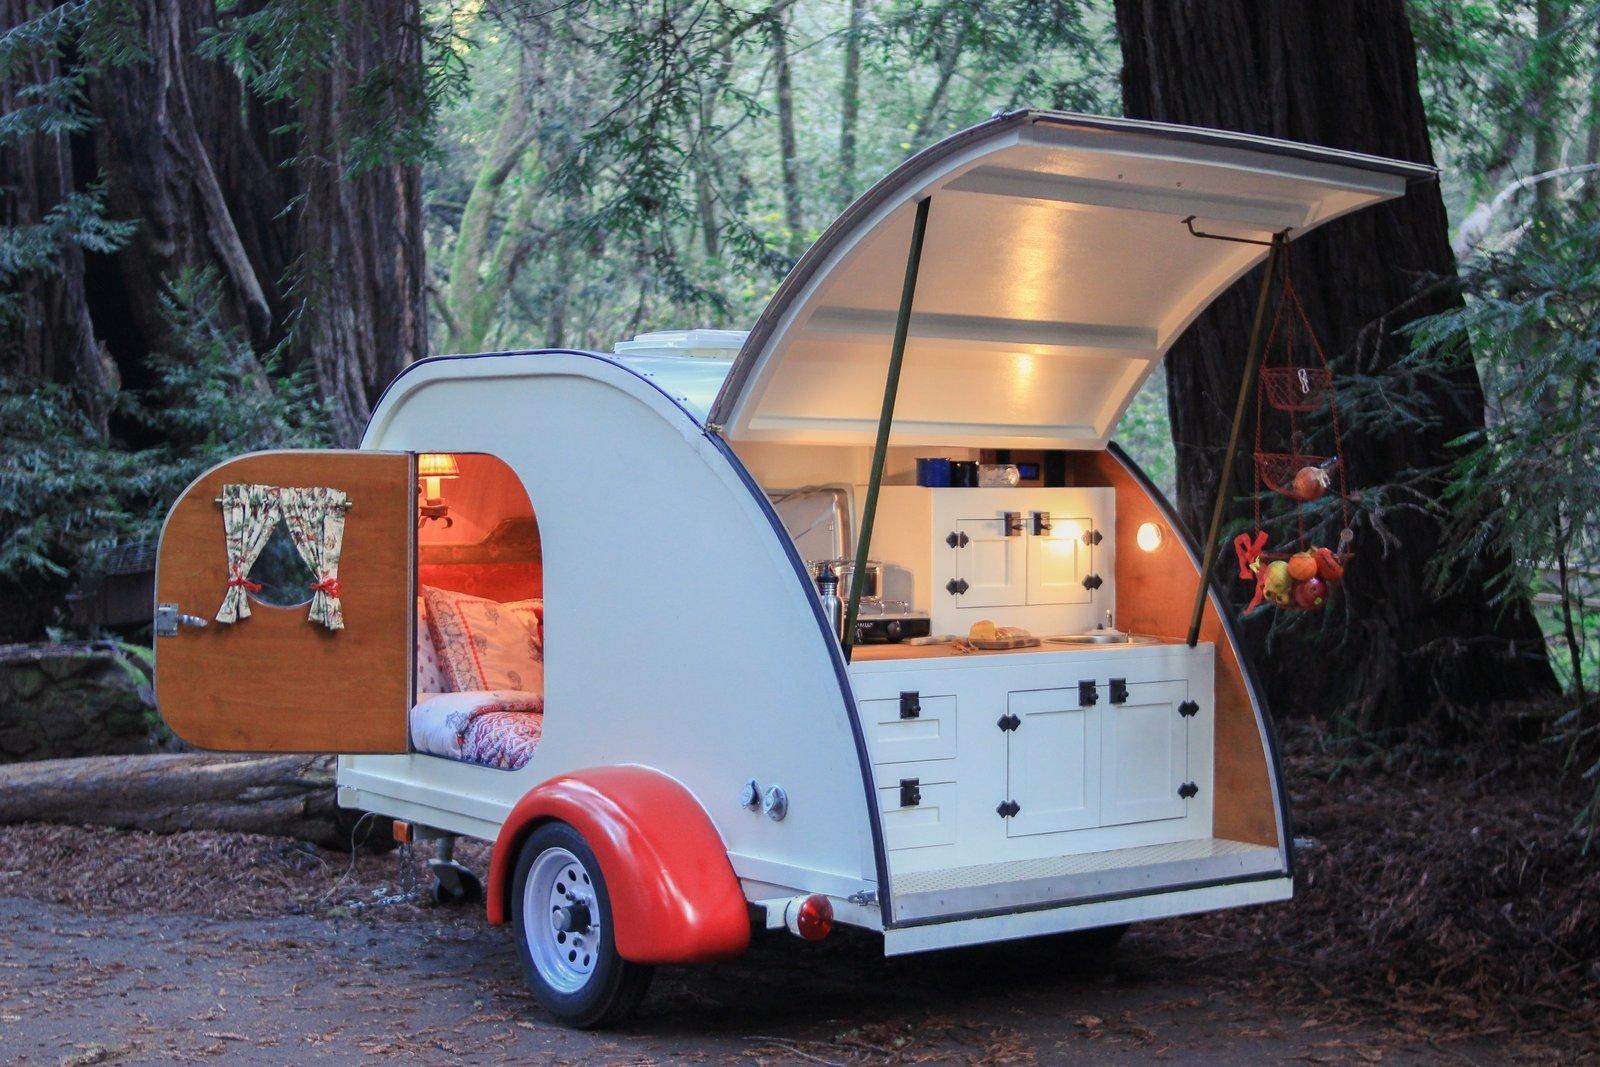 Camp Weathered teardrop trailer exterior